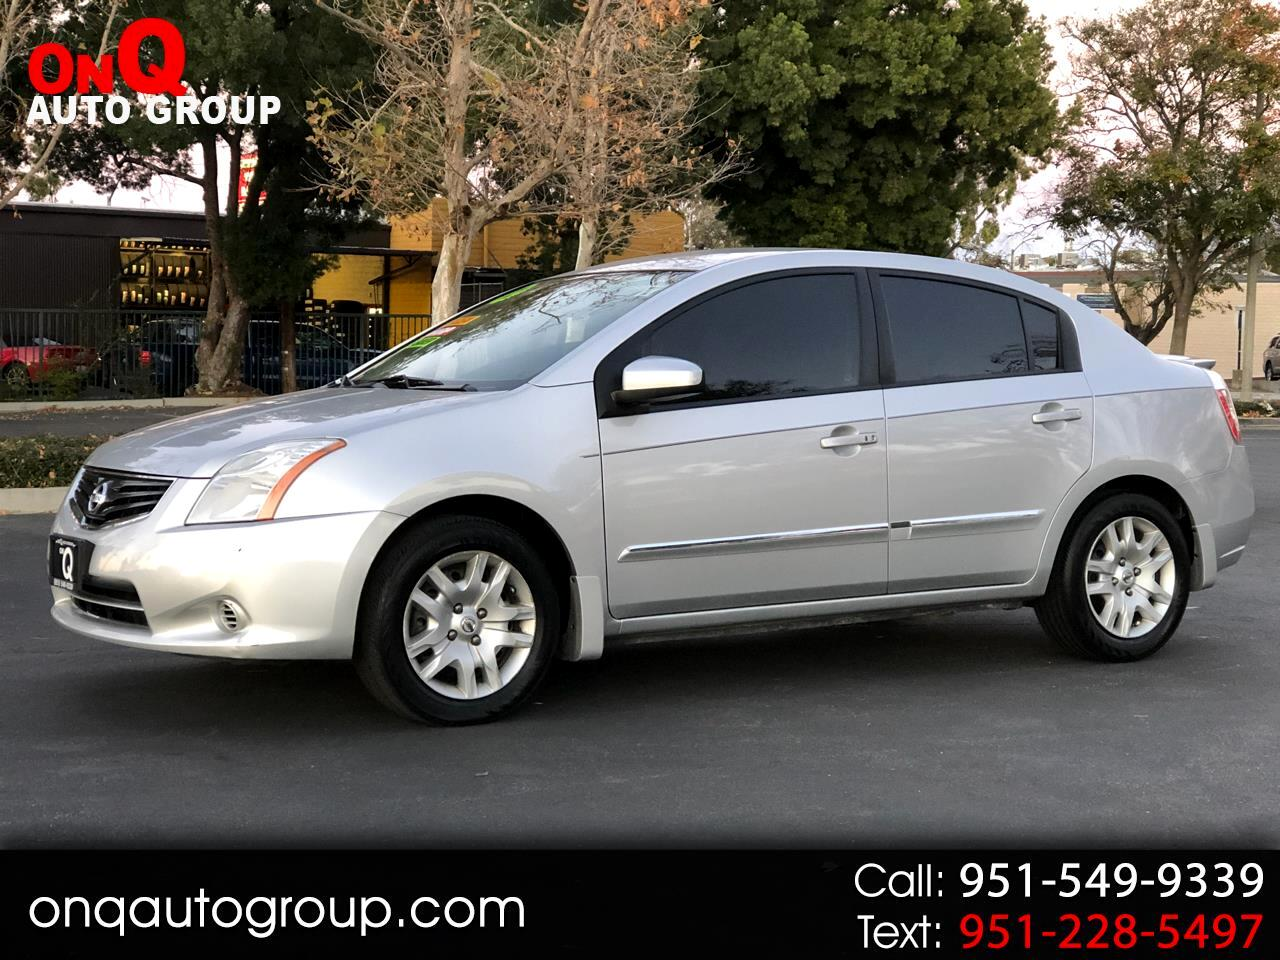 2012 Nissan Sentra 4dr Sdn I4 CVT 2.0 S